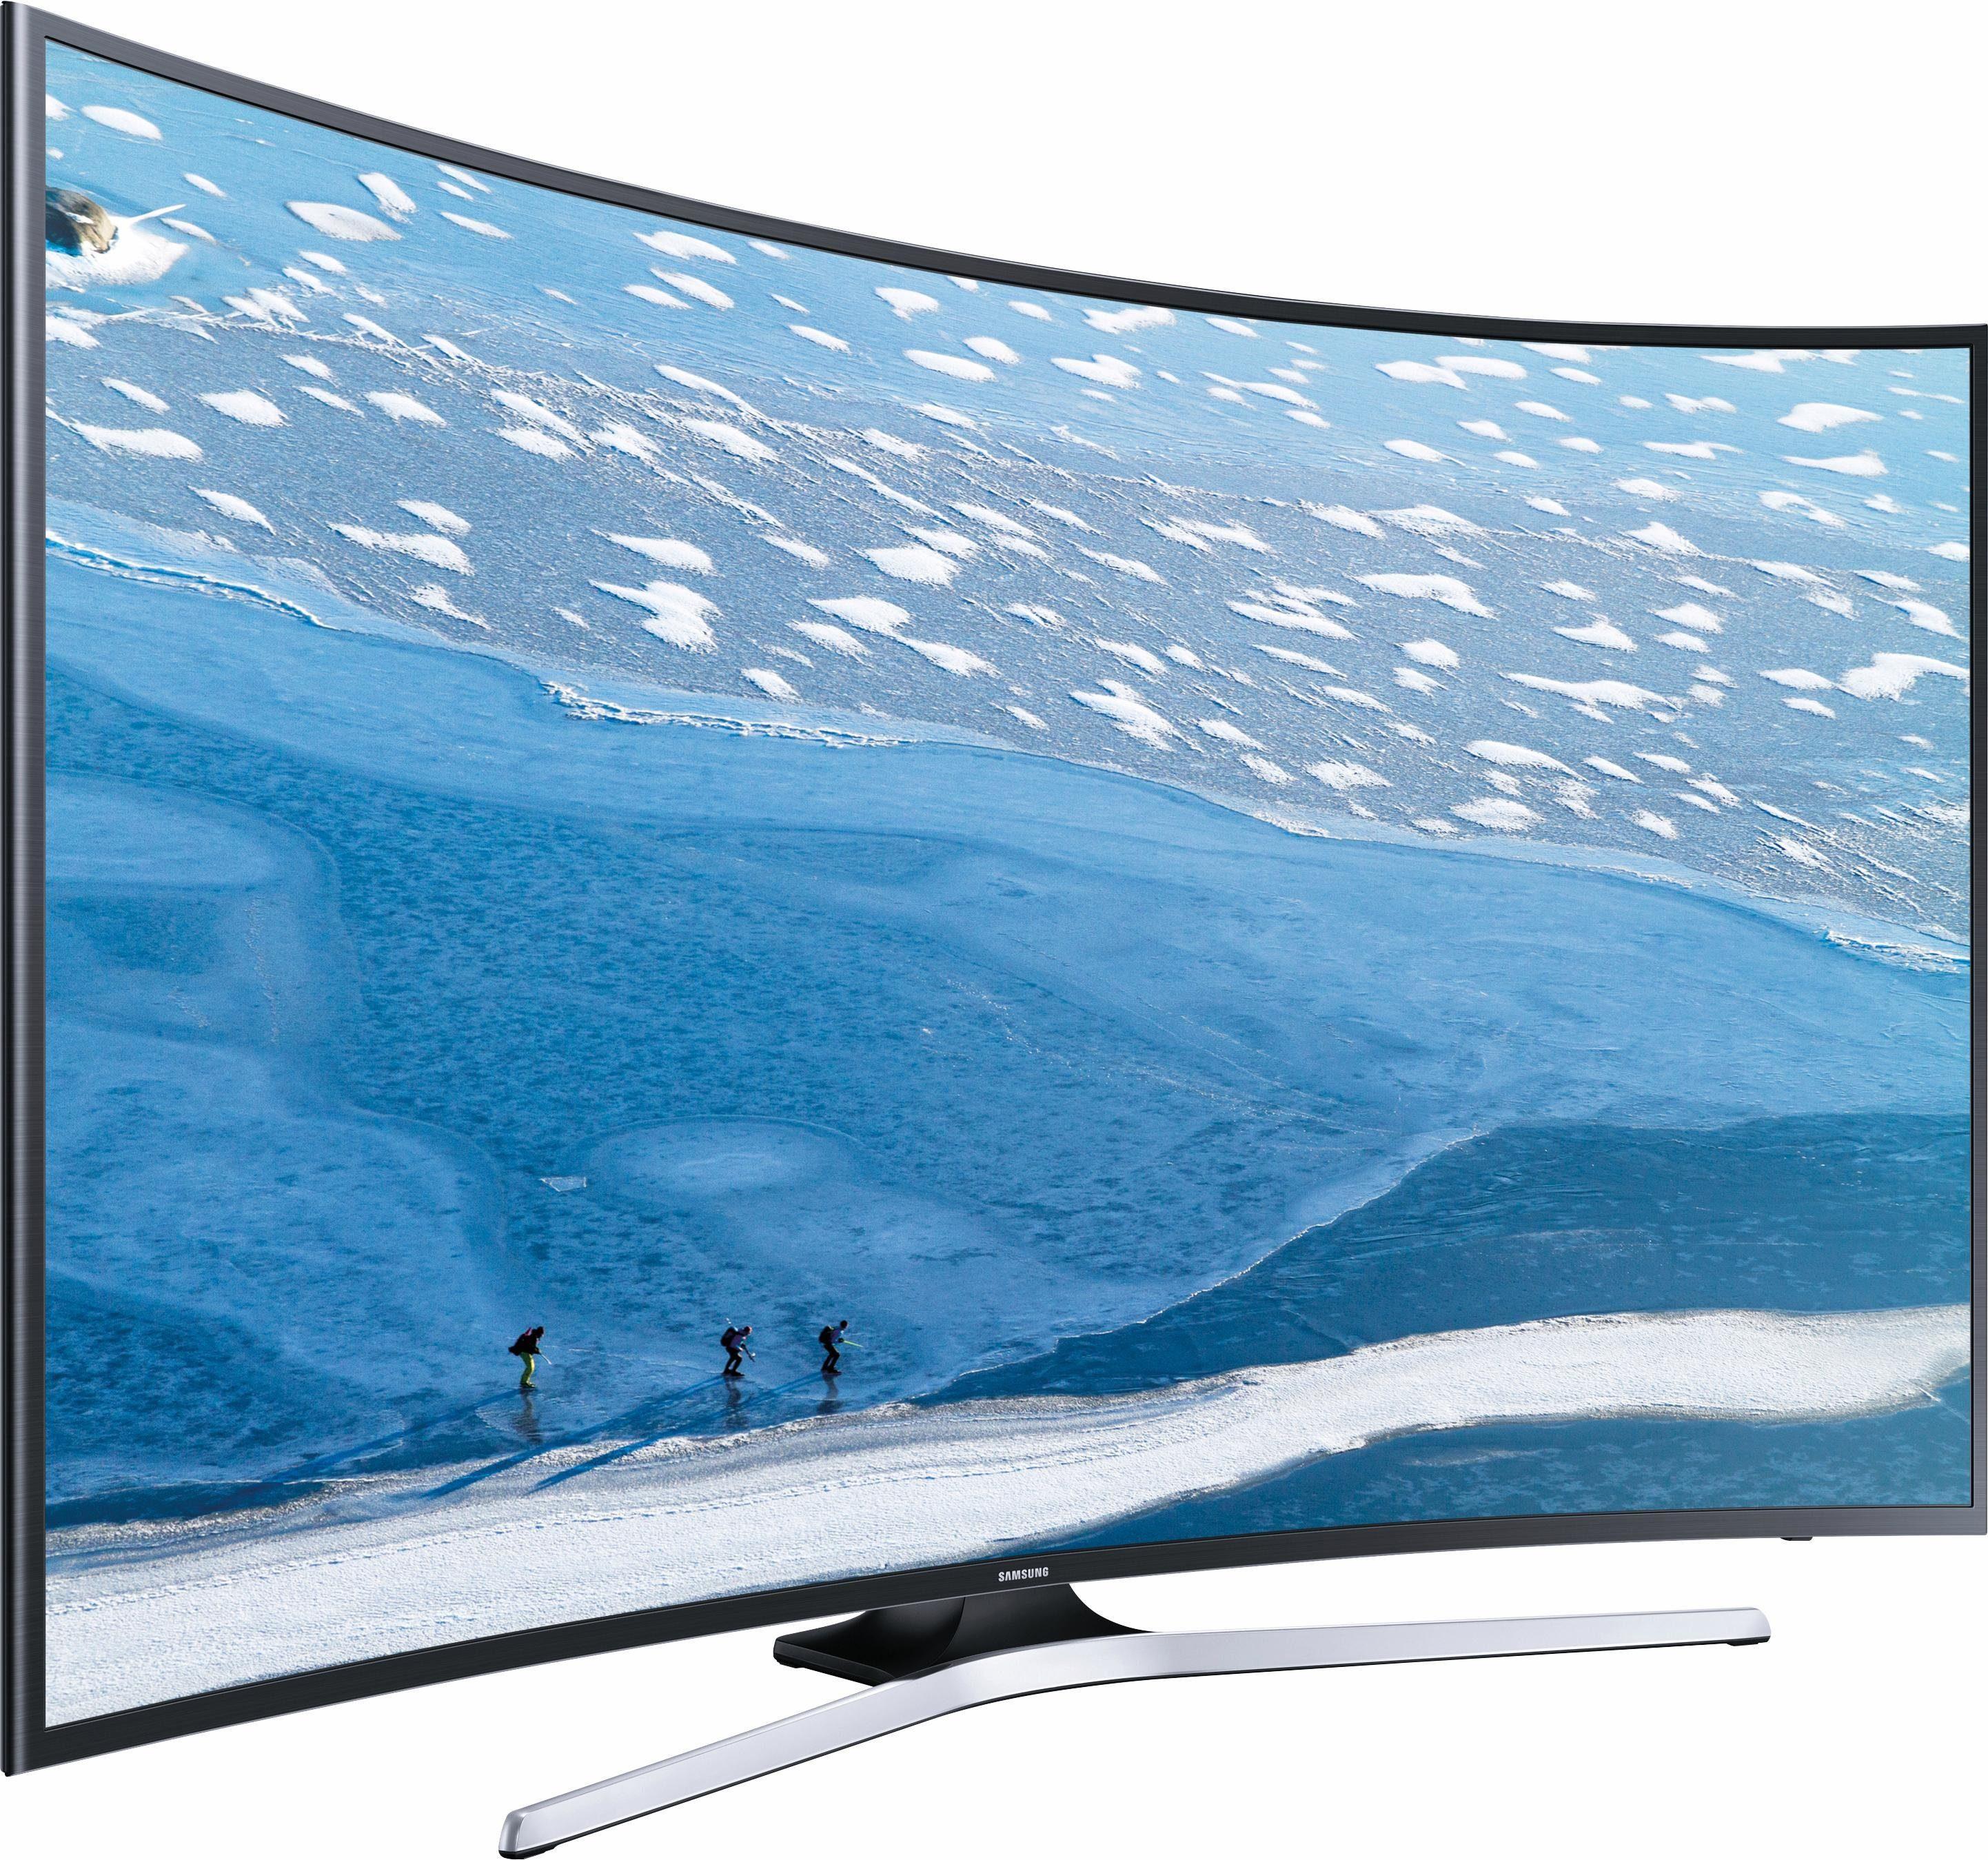 Samsung UE49KU6179UXZG, Curved-LED-Fernseher, 123 cm (49 Zoll), 2160p (4K Ultra HD), Smart-TV